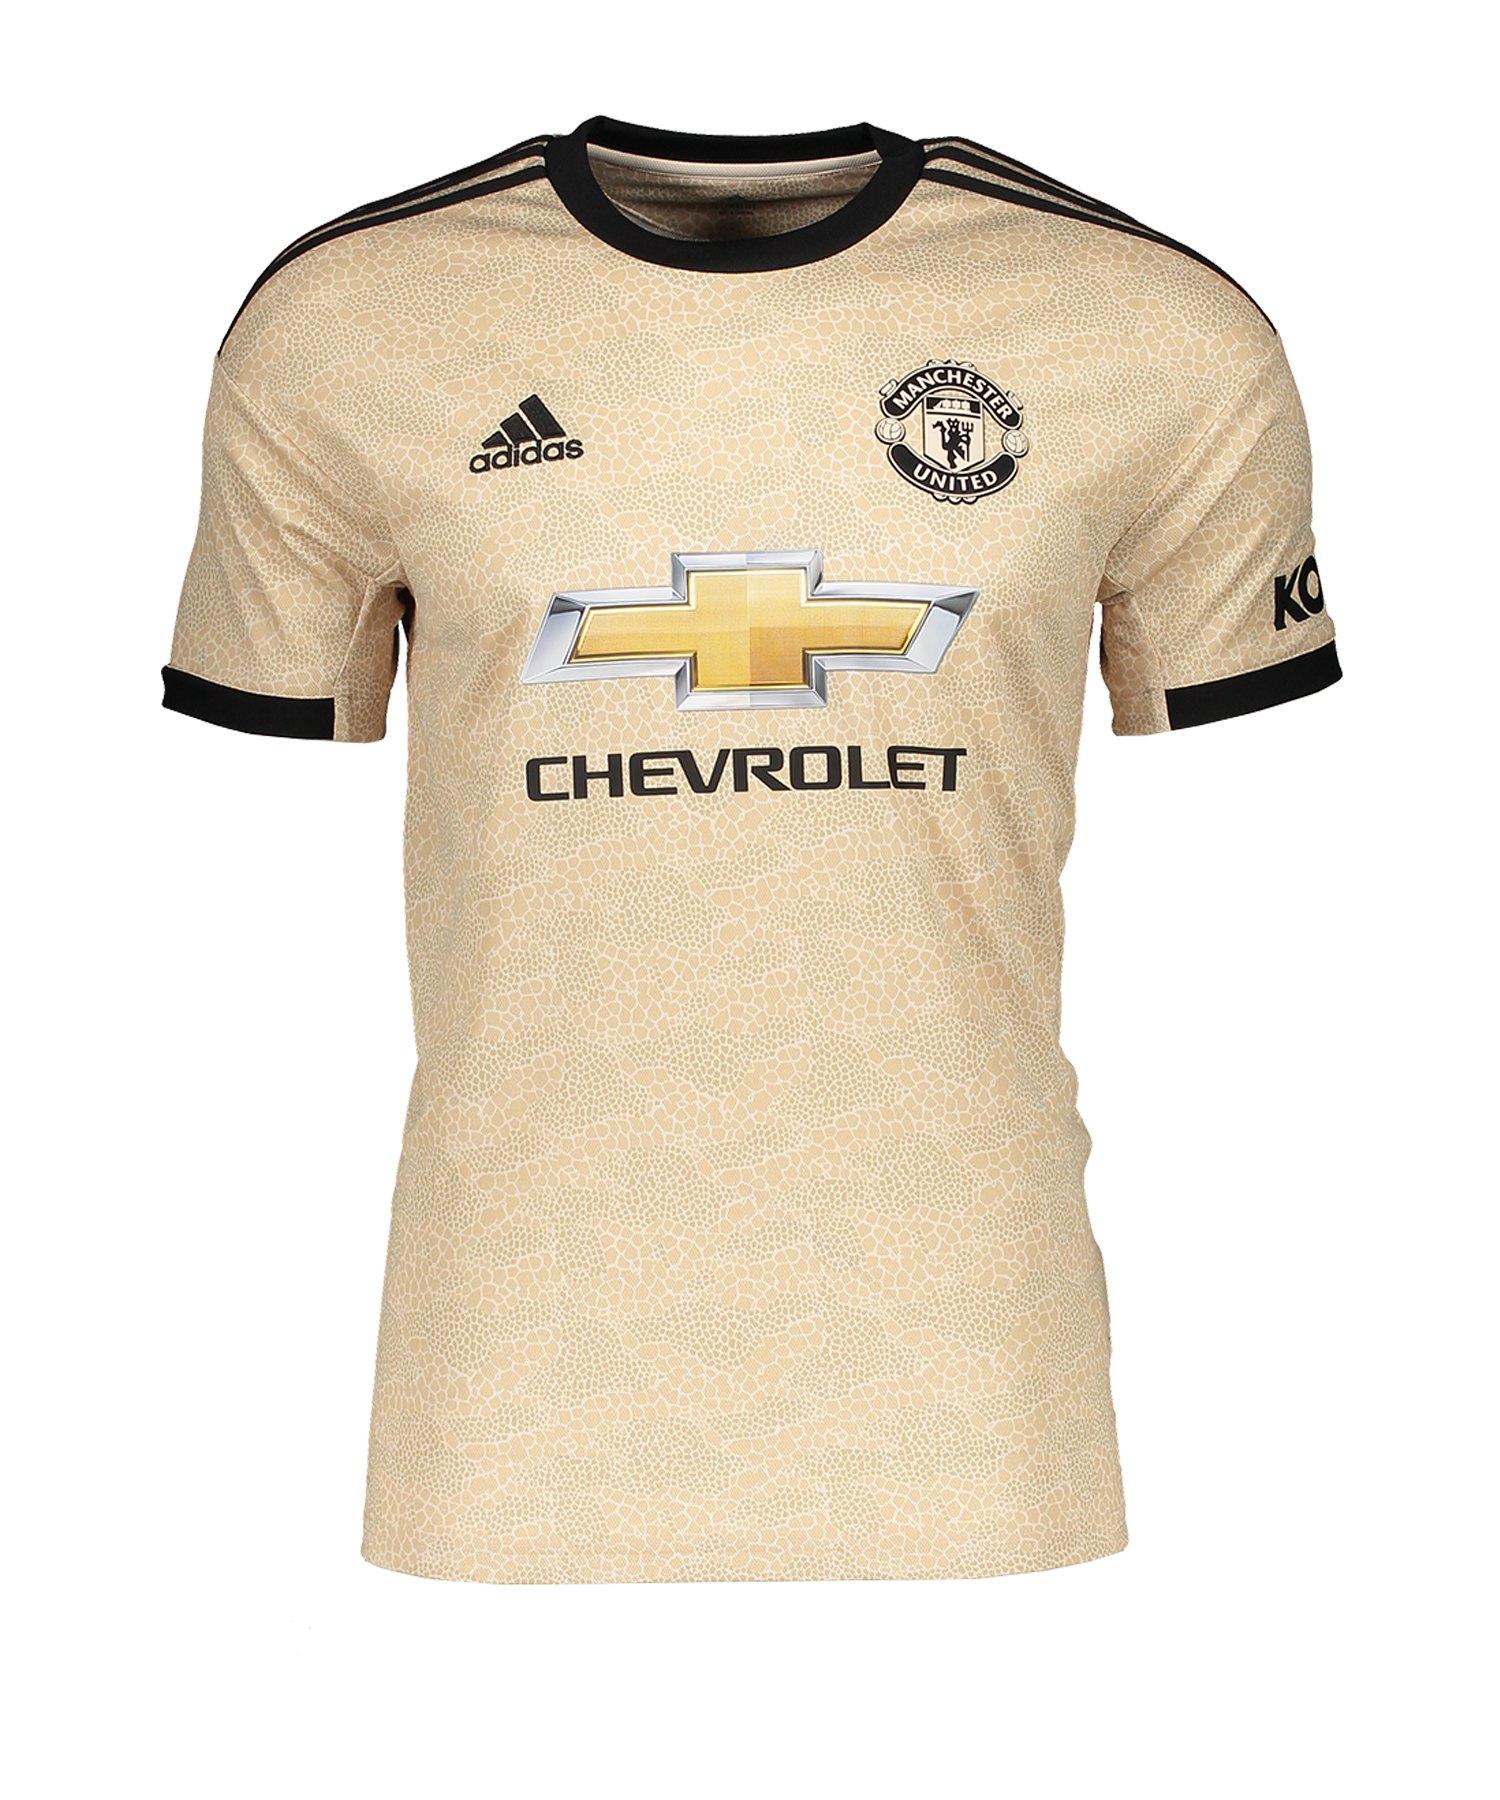 adidas Manchester United Trikot Away 2019/2020 - beige